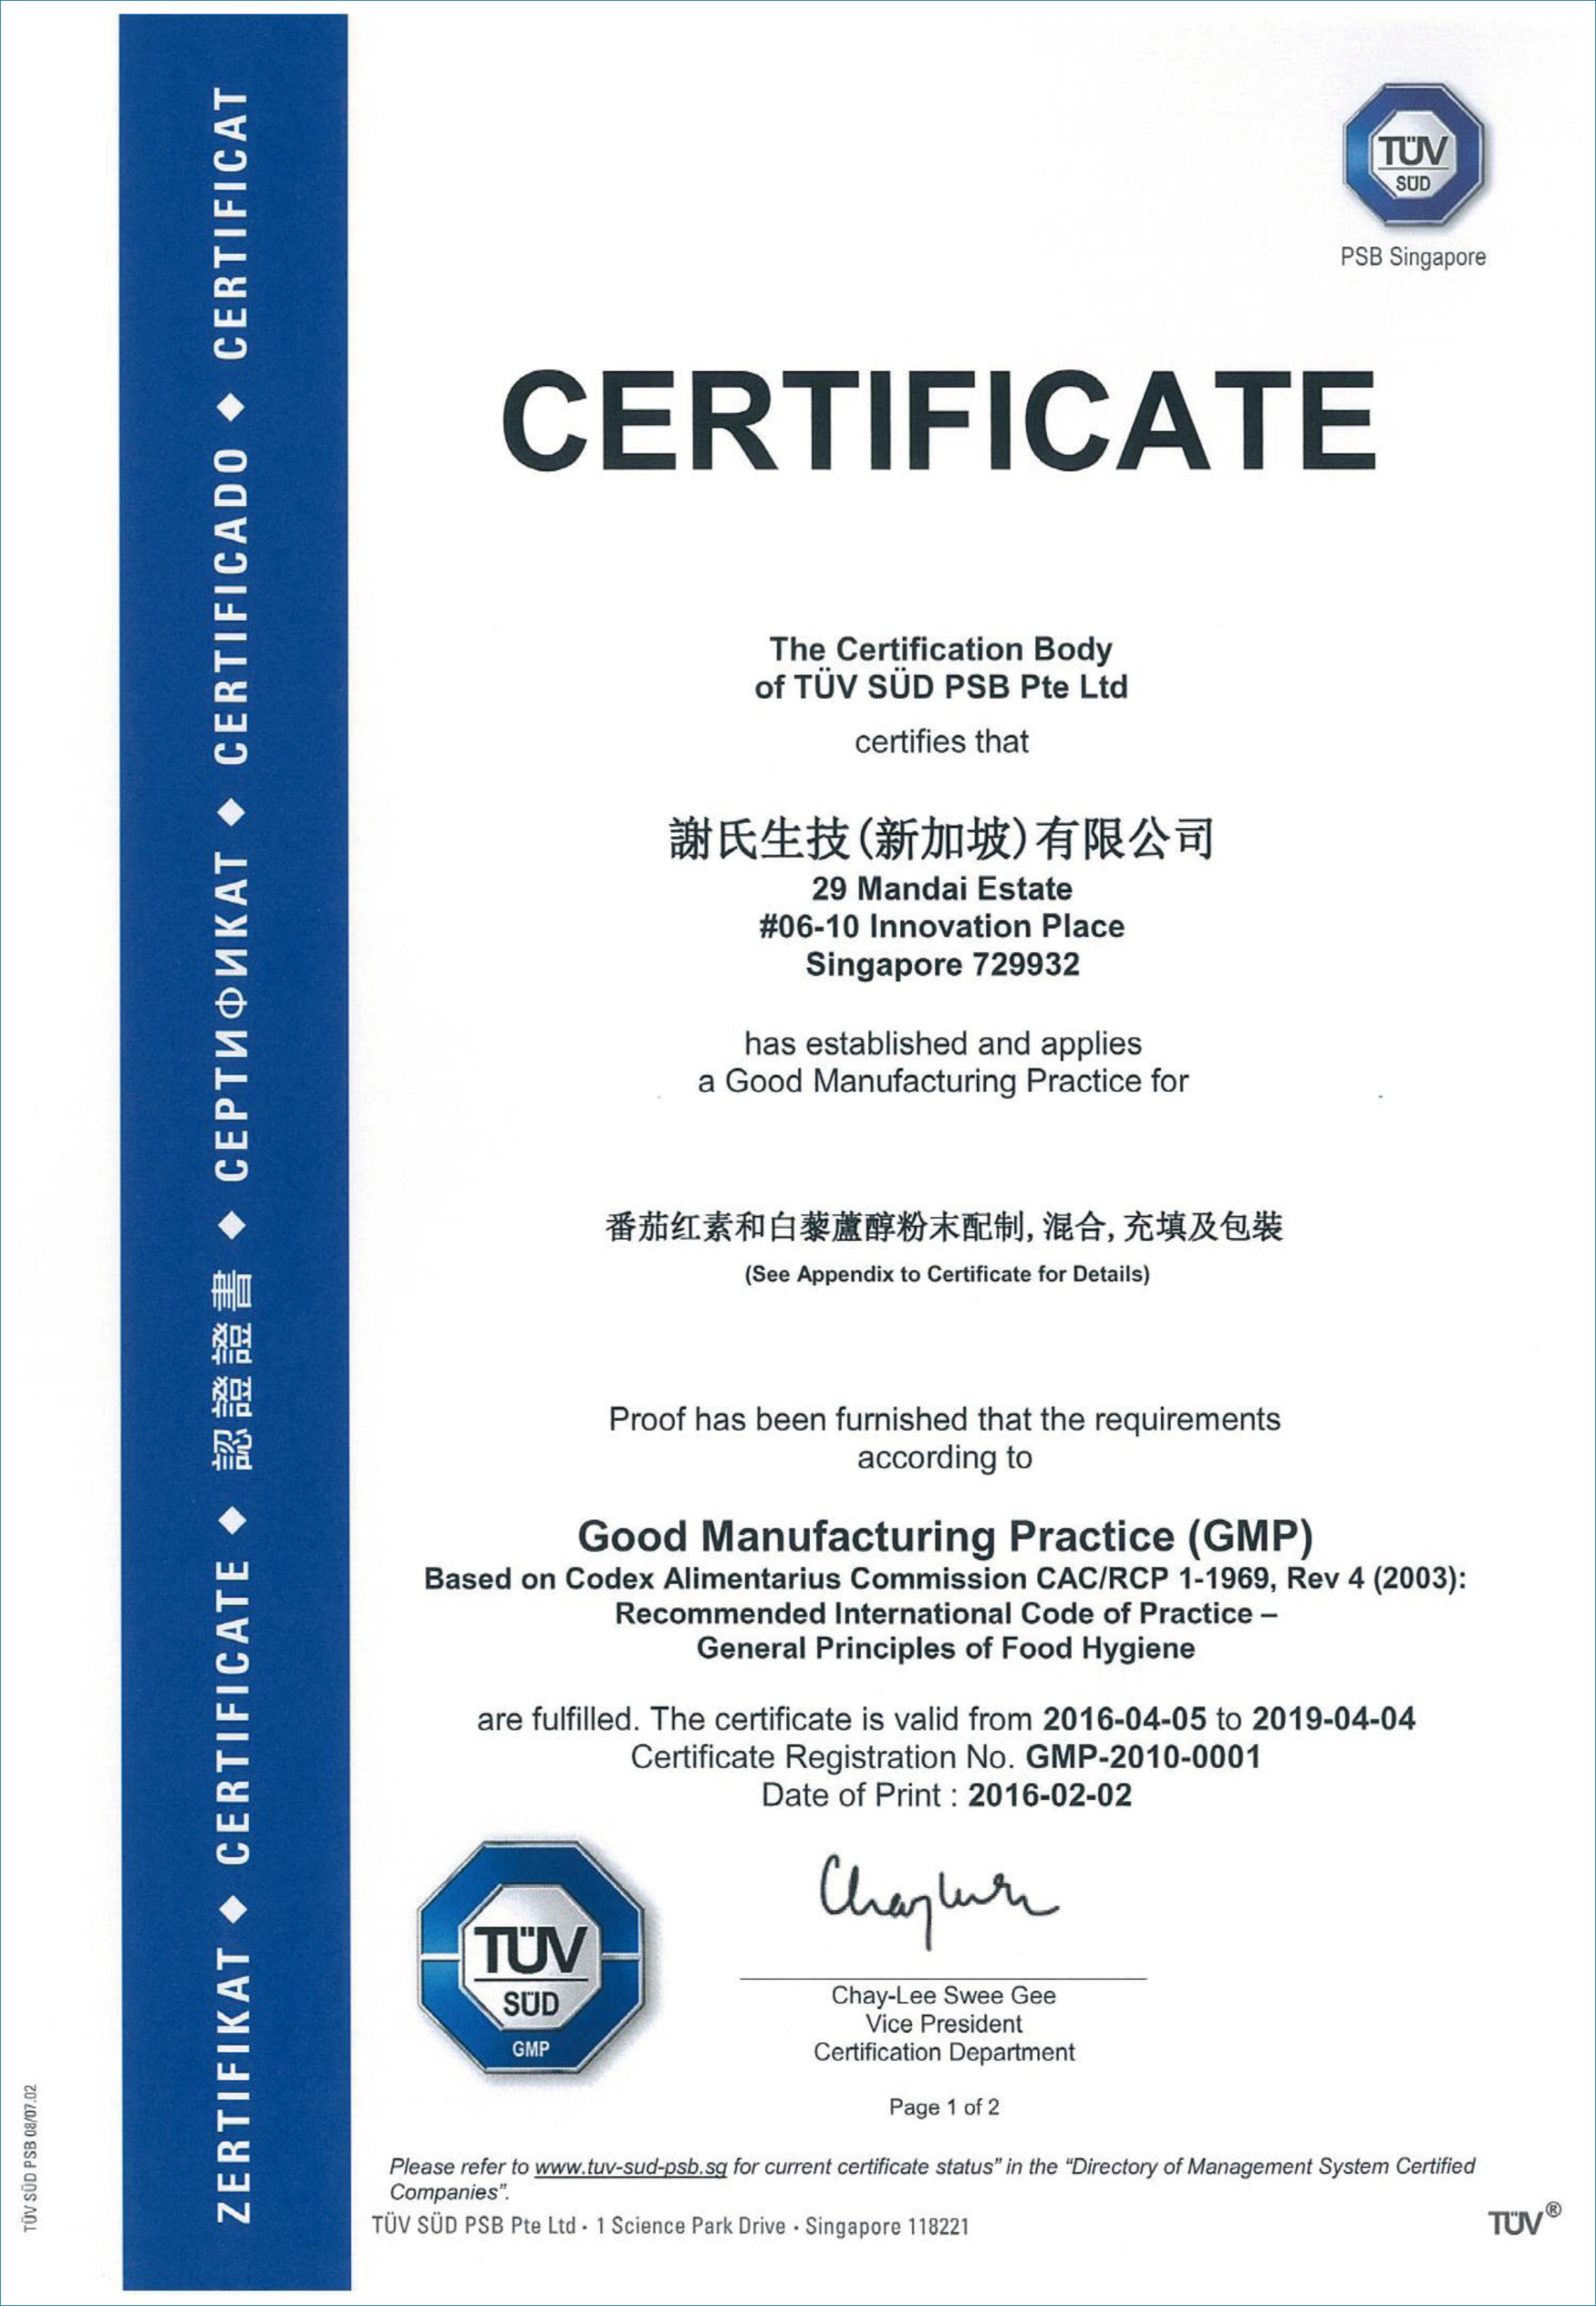 TUV SUD Codex GMP Certificate - Certificates - HSIEHS BIOTECH